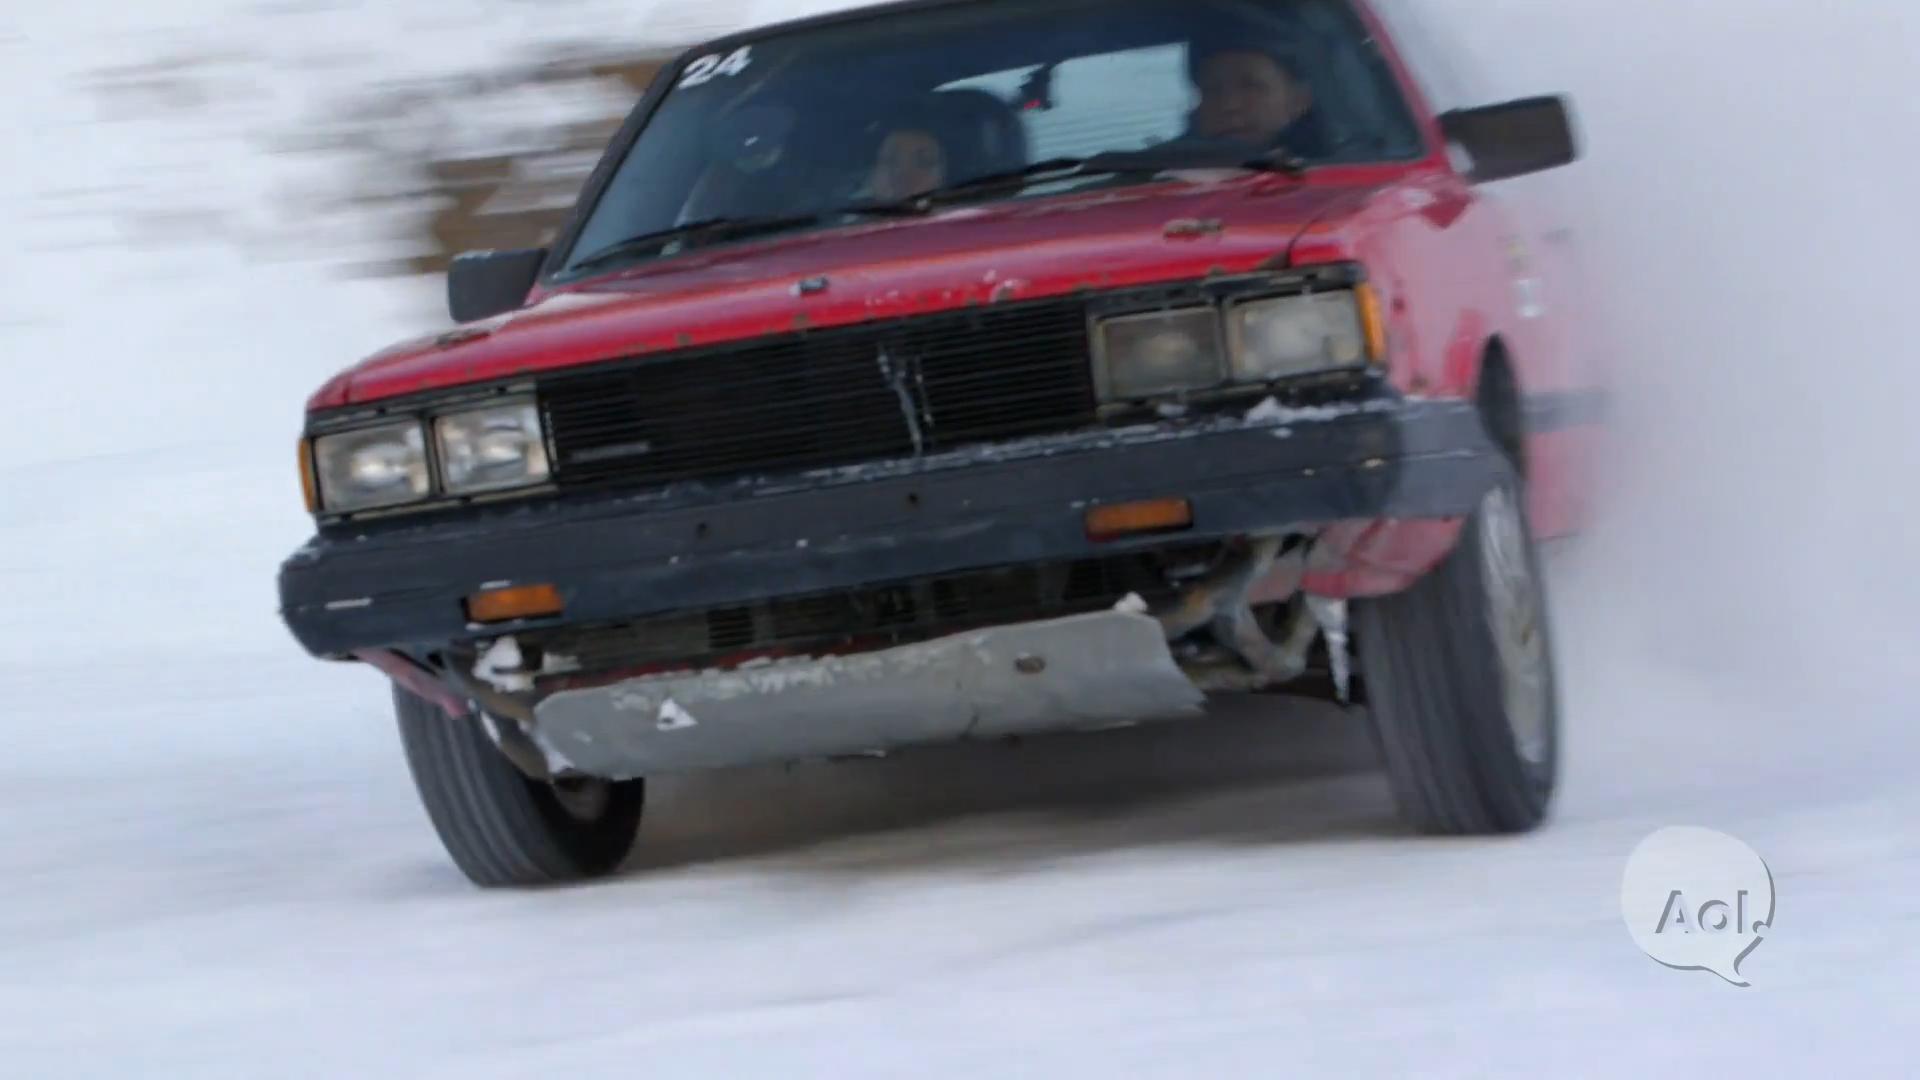 You can own this legendary Subaru rally car - Autoblog